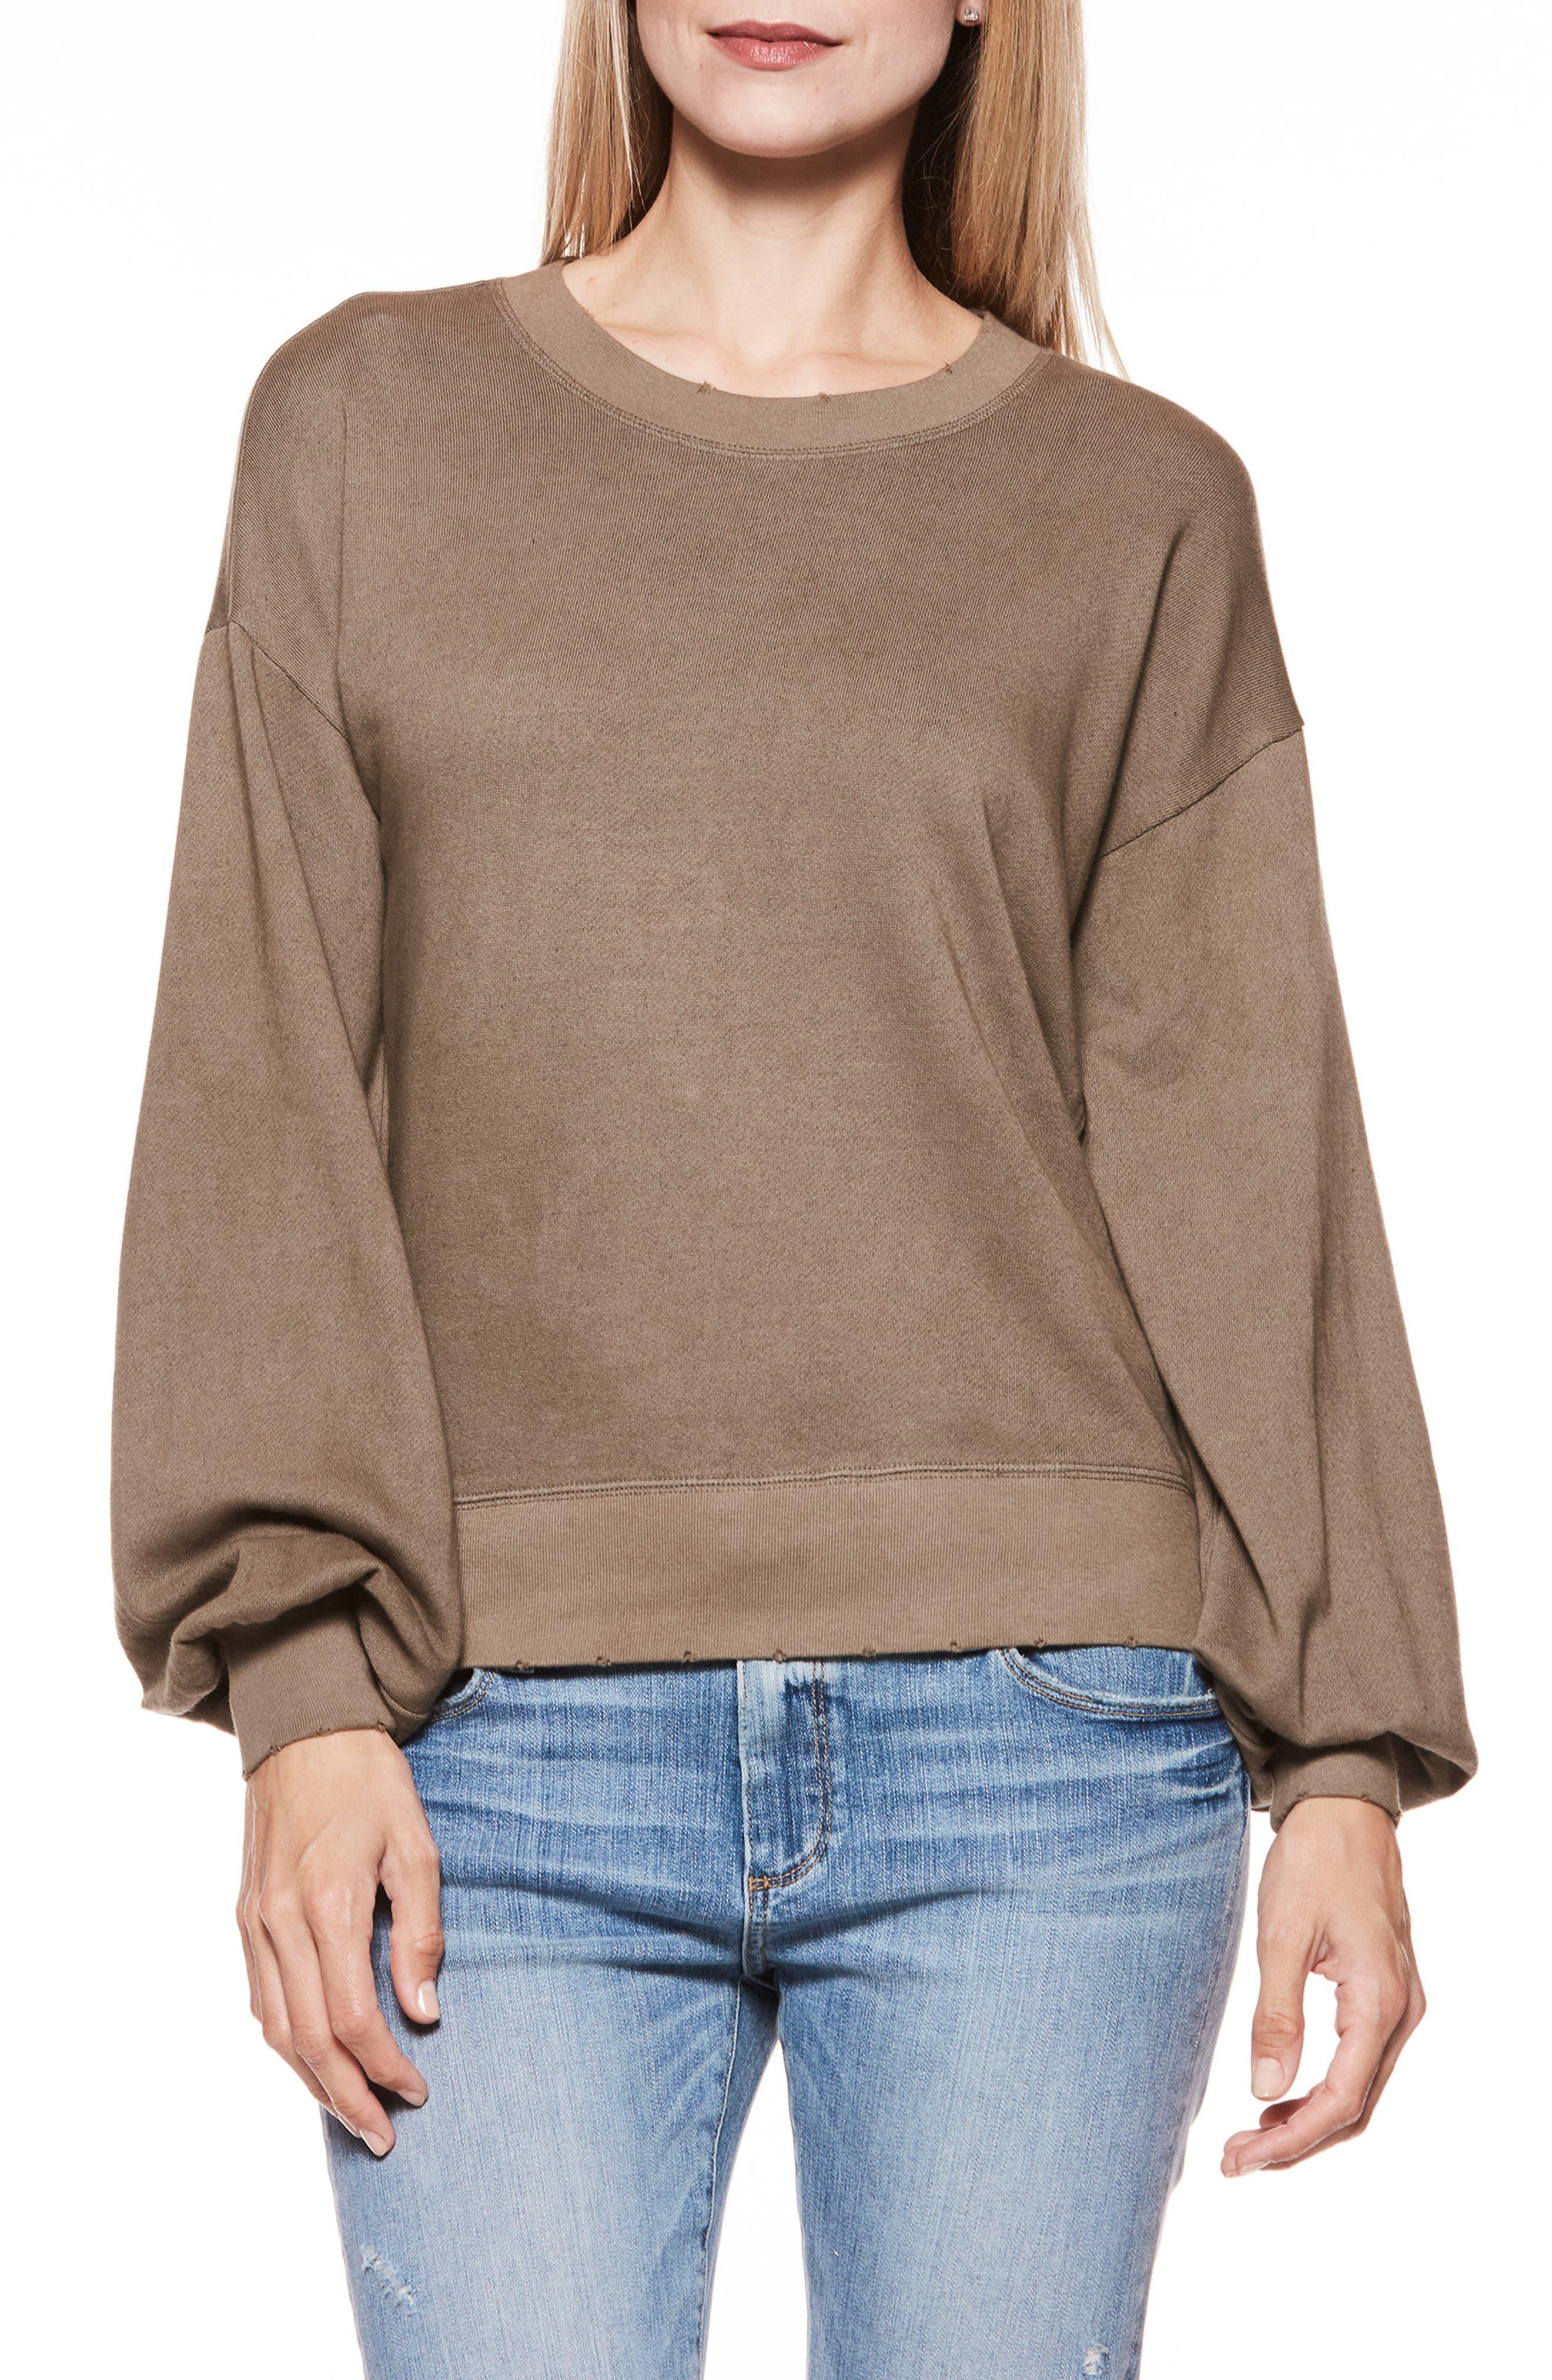 Cortlynn Sweatshirt,                             Main thumbnail 1, color,                             Tanned Olive